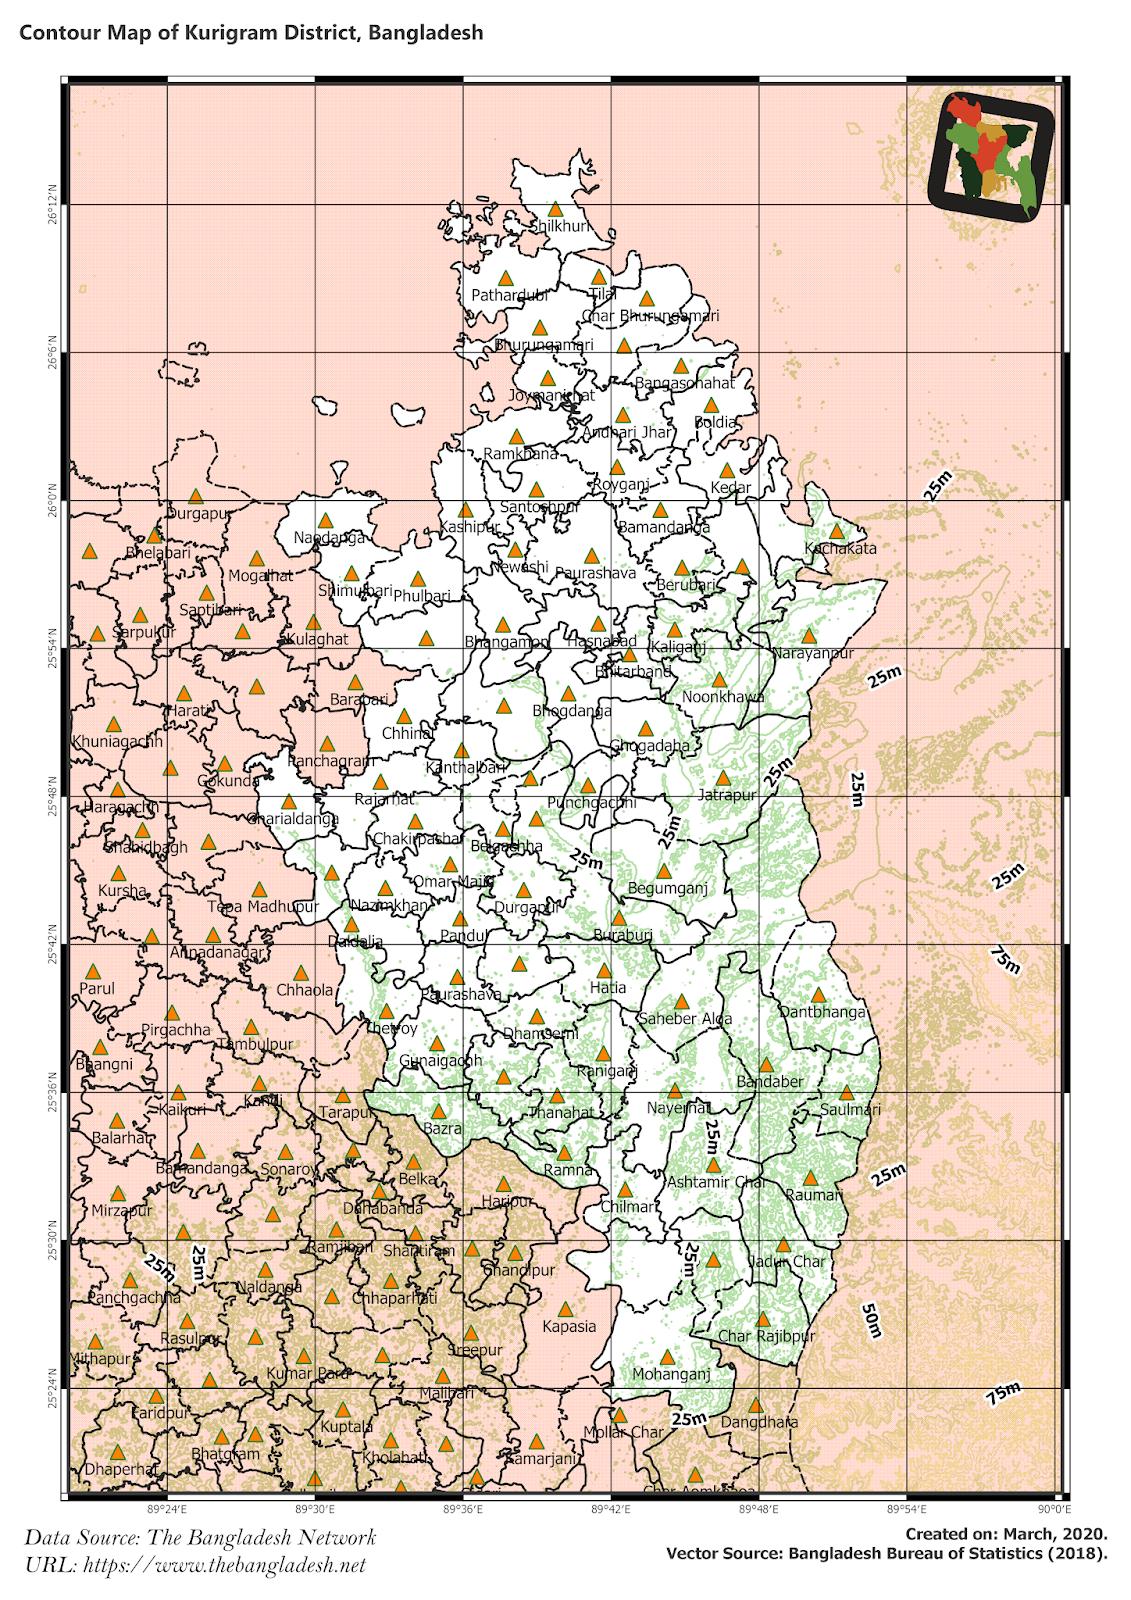 Elevation Map of Kurigram District of Bangladesh